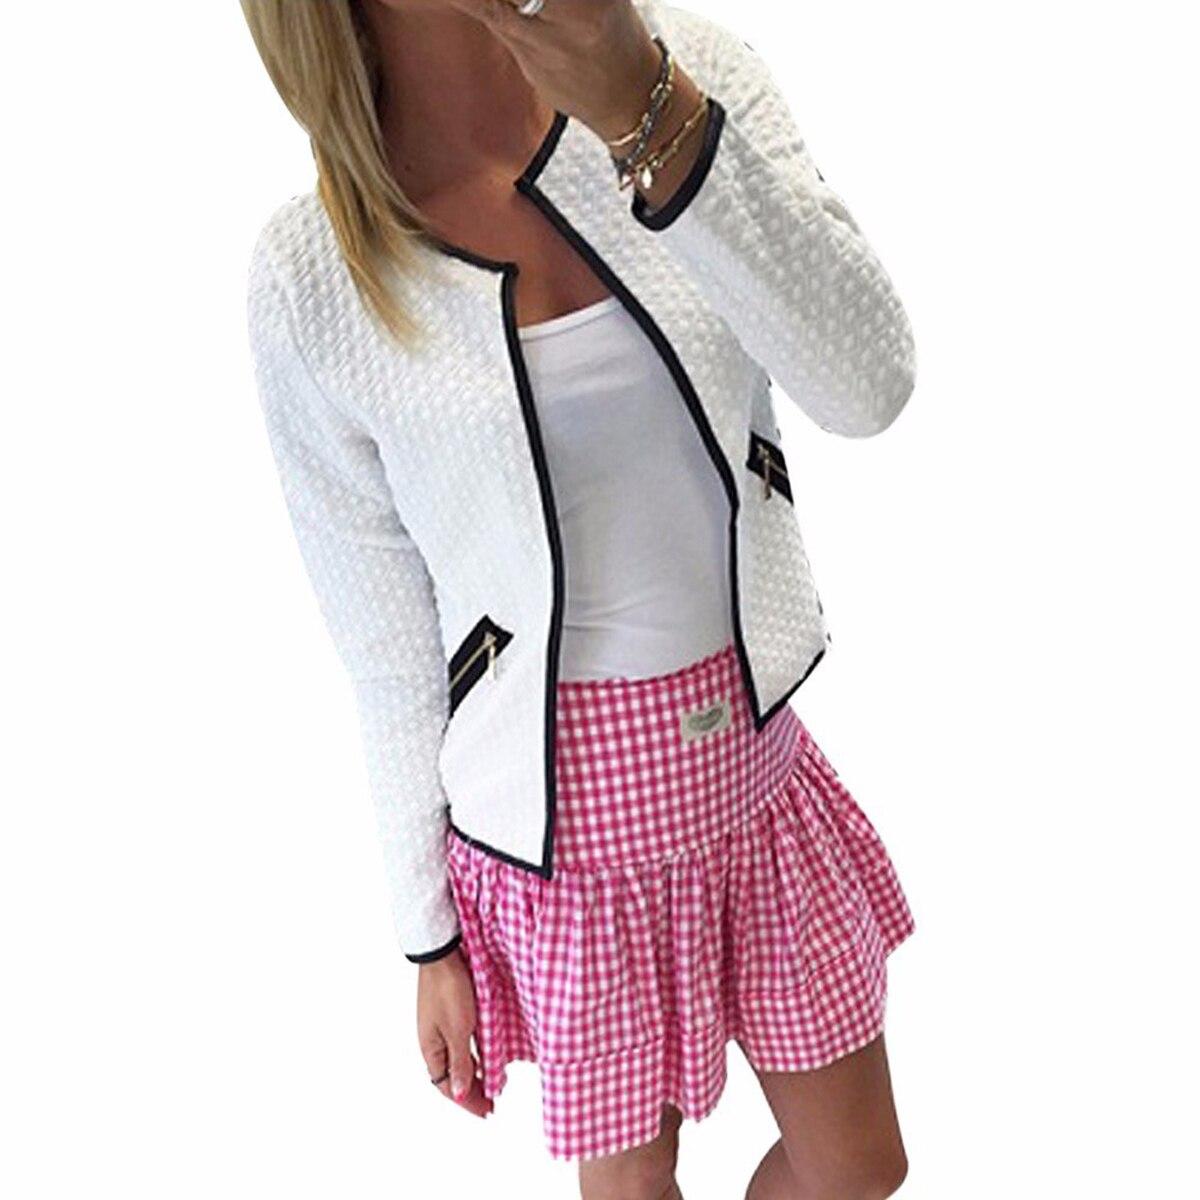 Women Bomper   Jacket   Spring Autumn Women   Basic     Jacket   Long Sleeve Pockets Slim Short Cardigan Coat Casual Outwear Tracksuit